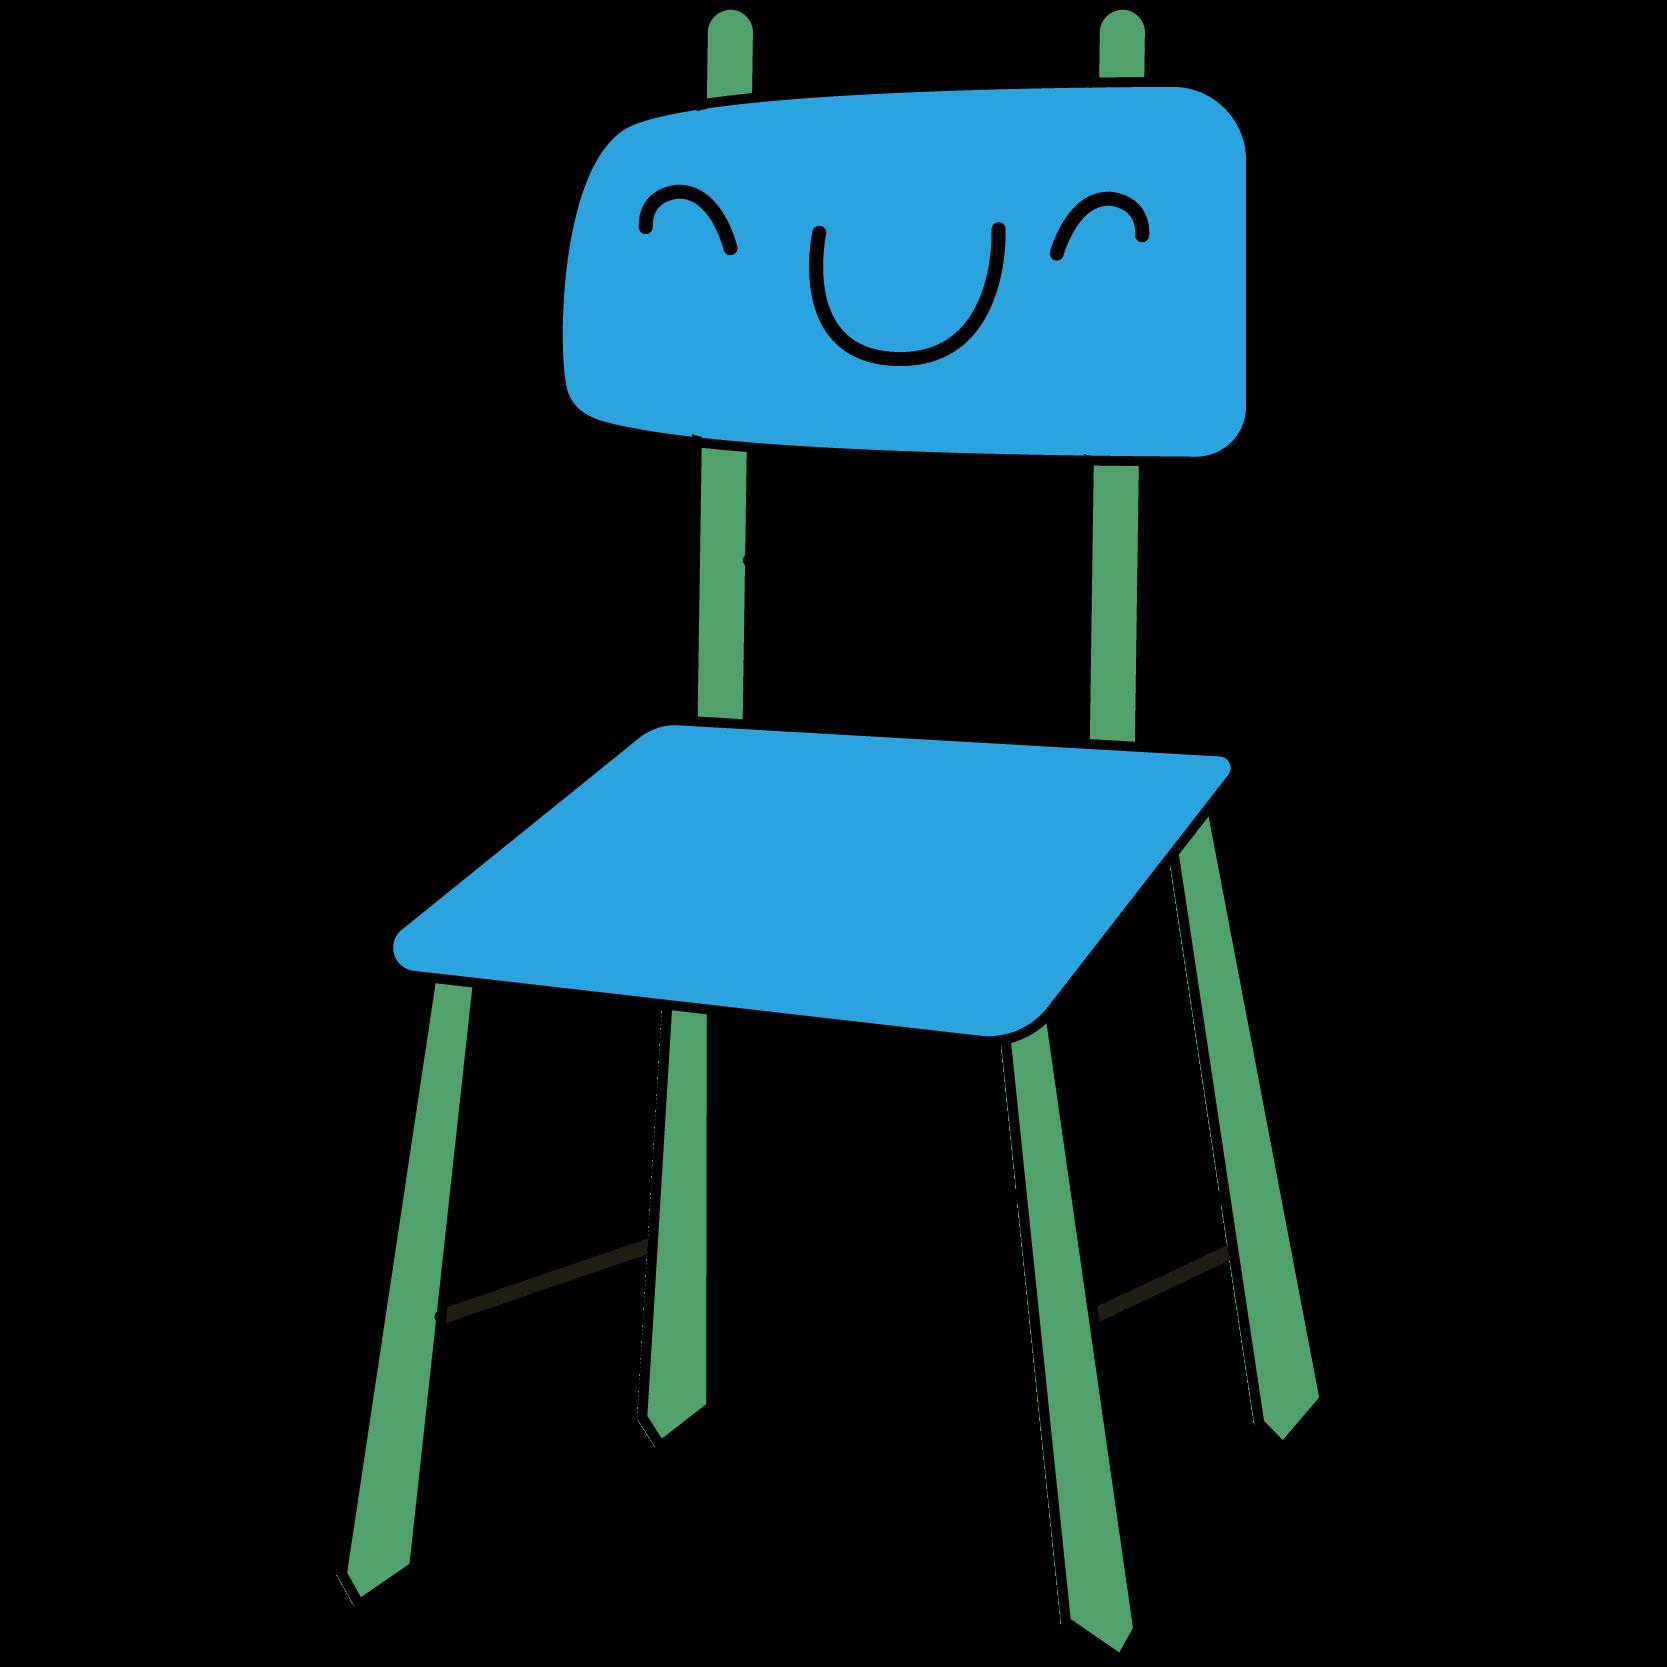 School Classroom Objects Esl Vocabulary Worksheets Flashcards Jimmyesl Flashcards Writing Practice For Kids Esl Vocabulary [ 1667 x 1667 Pixel ]